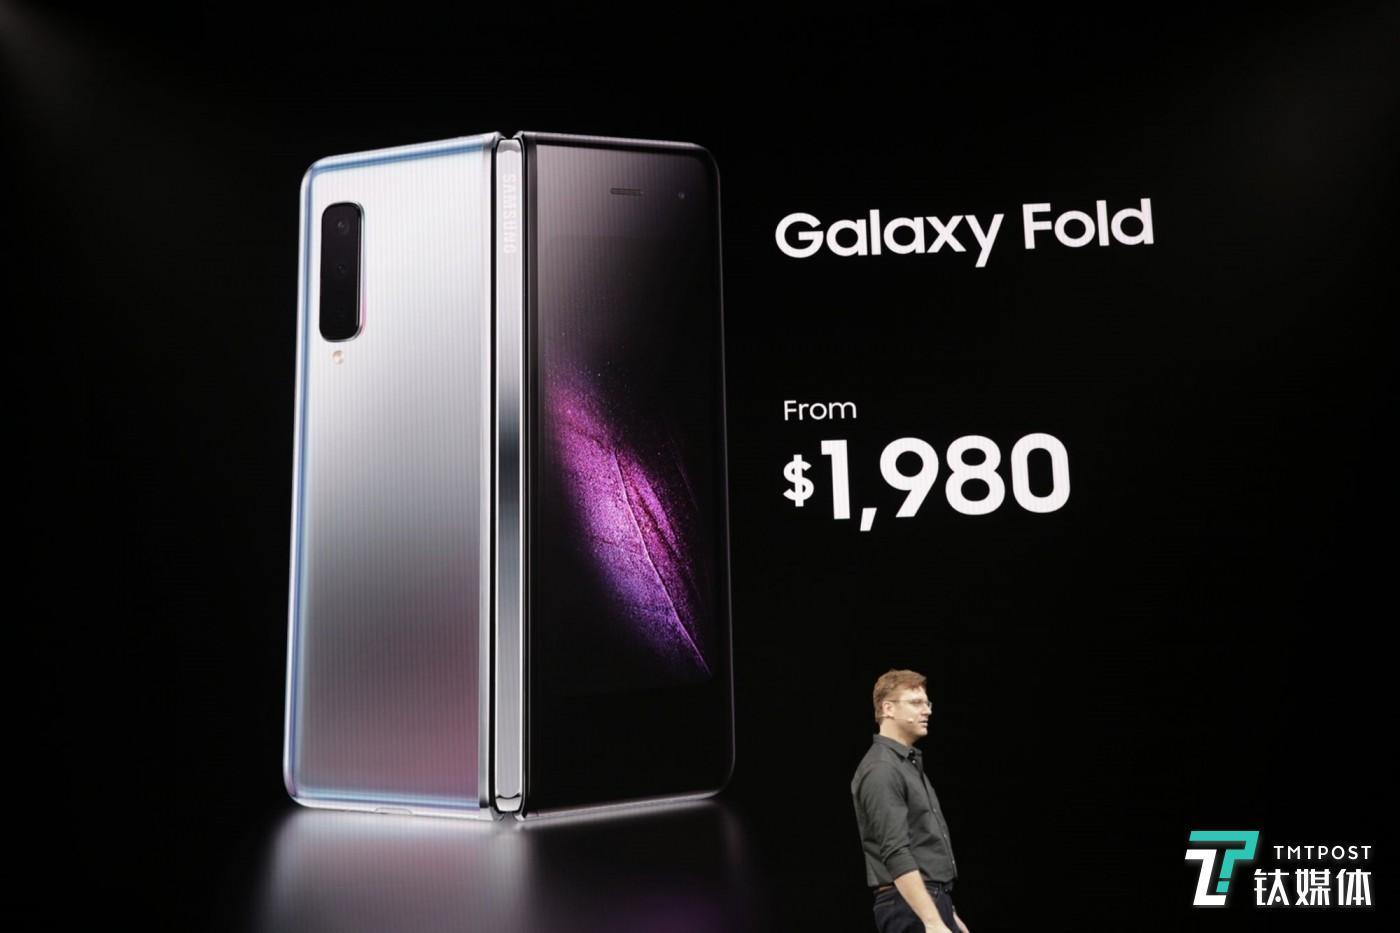 Galaxy Fold 售价 1980 美元,真的不来一台吗?